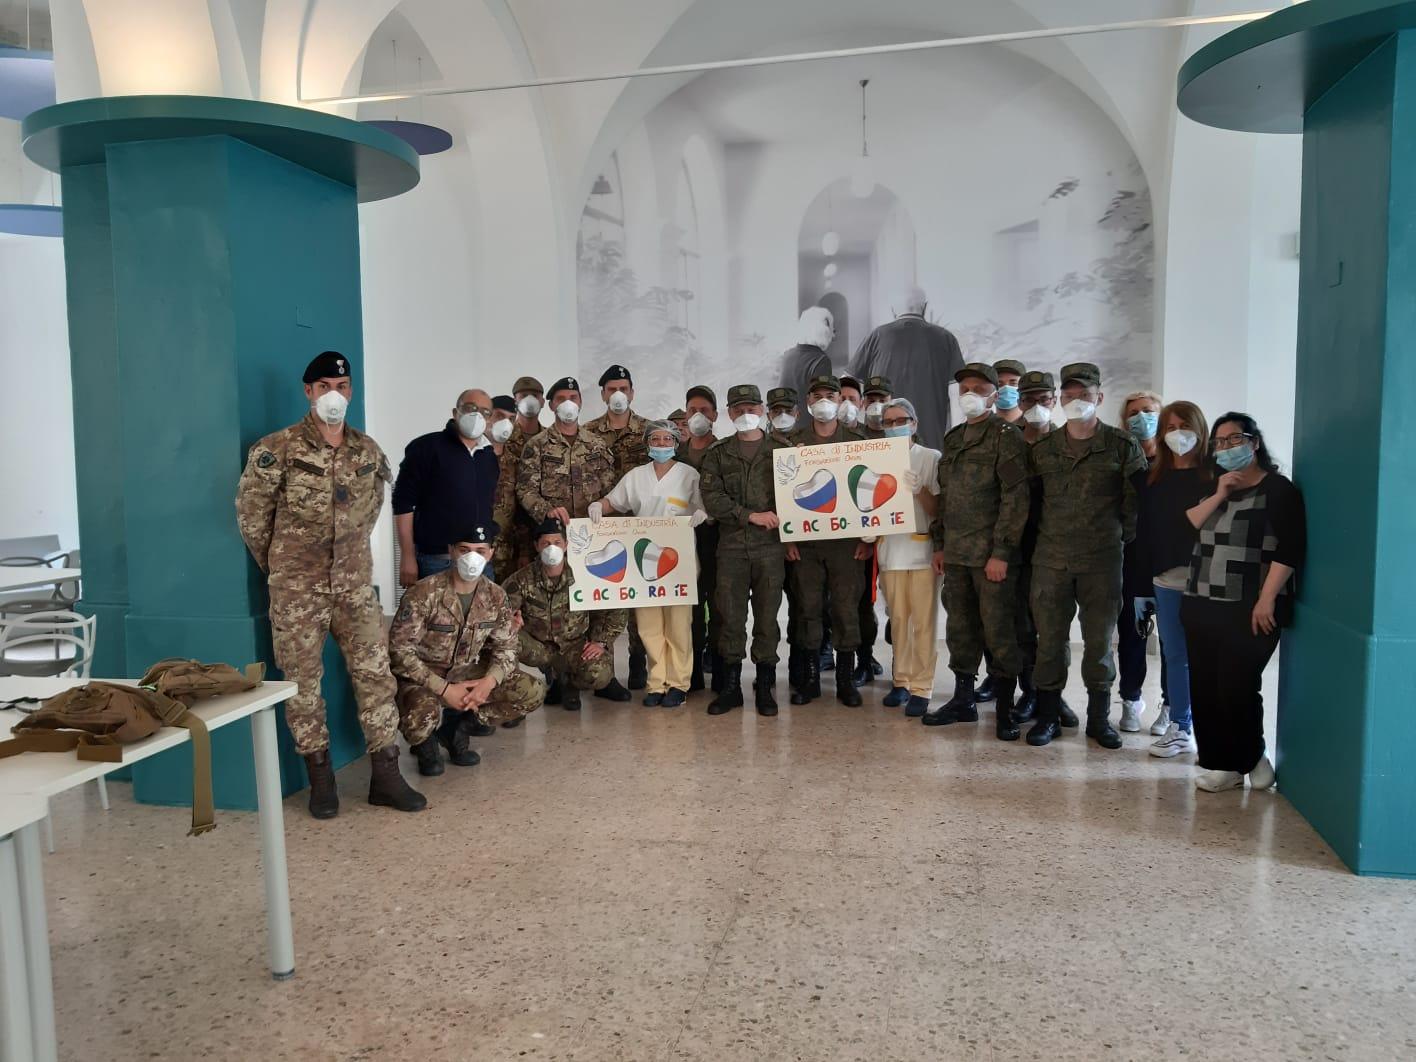 Militari italiani e russi a Casa di Industria